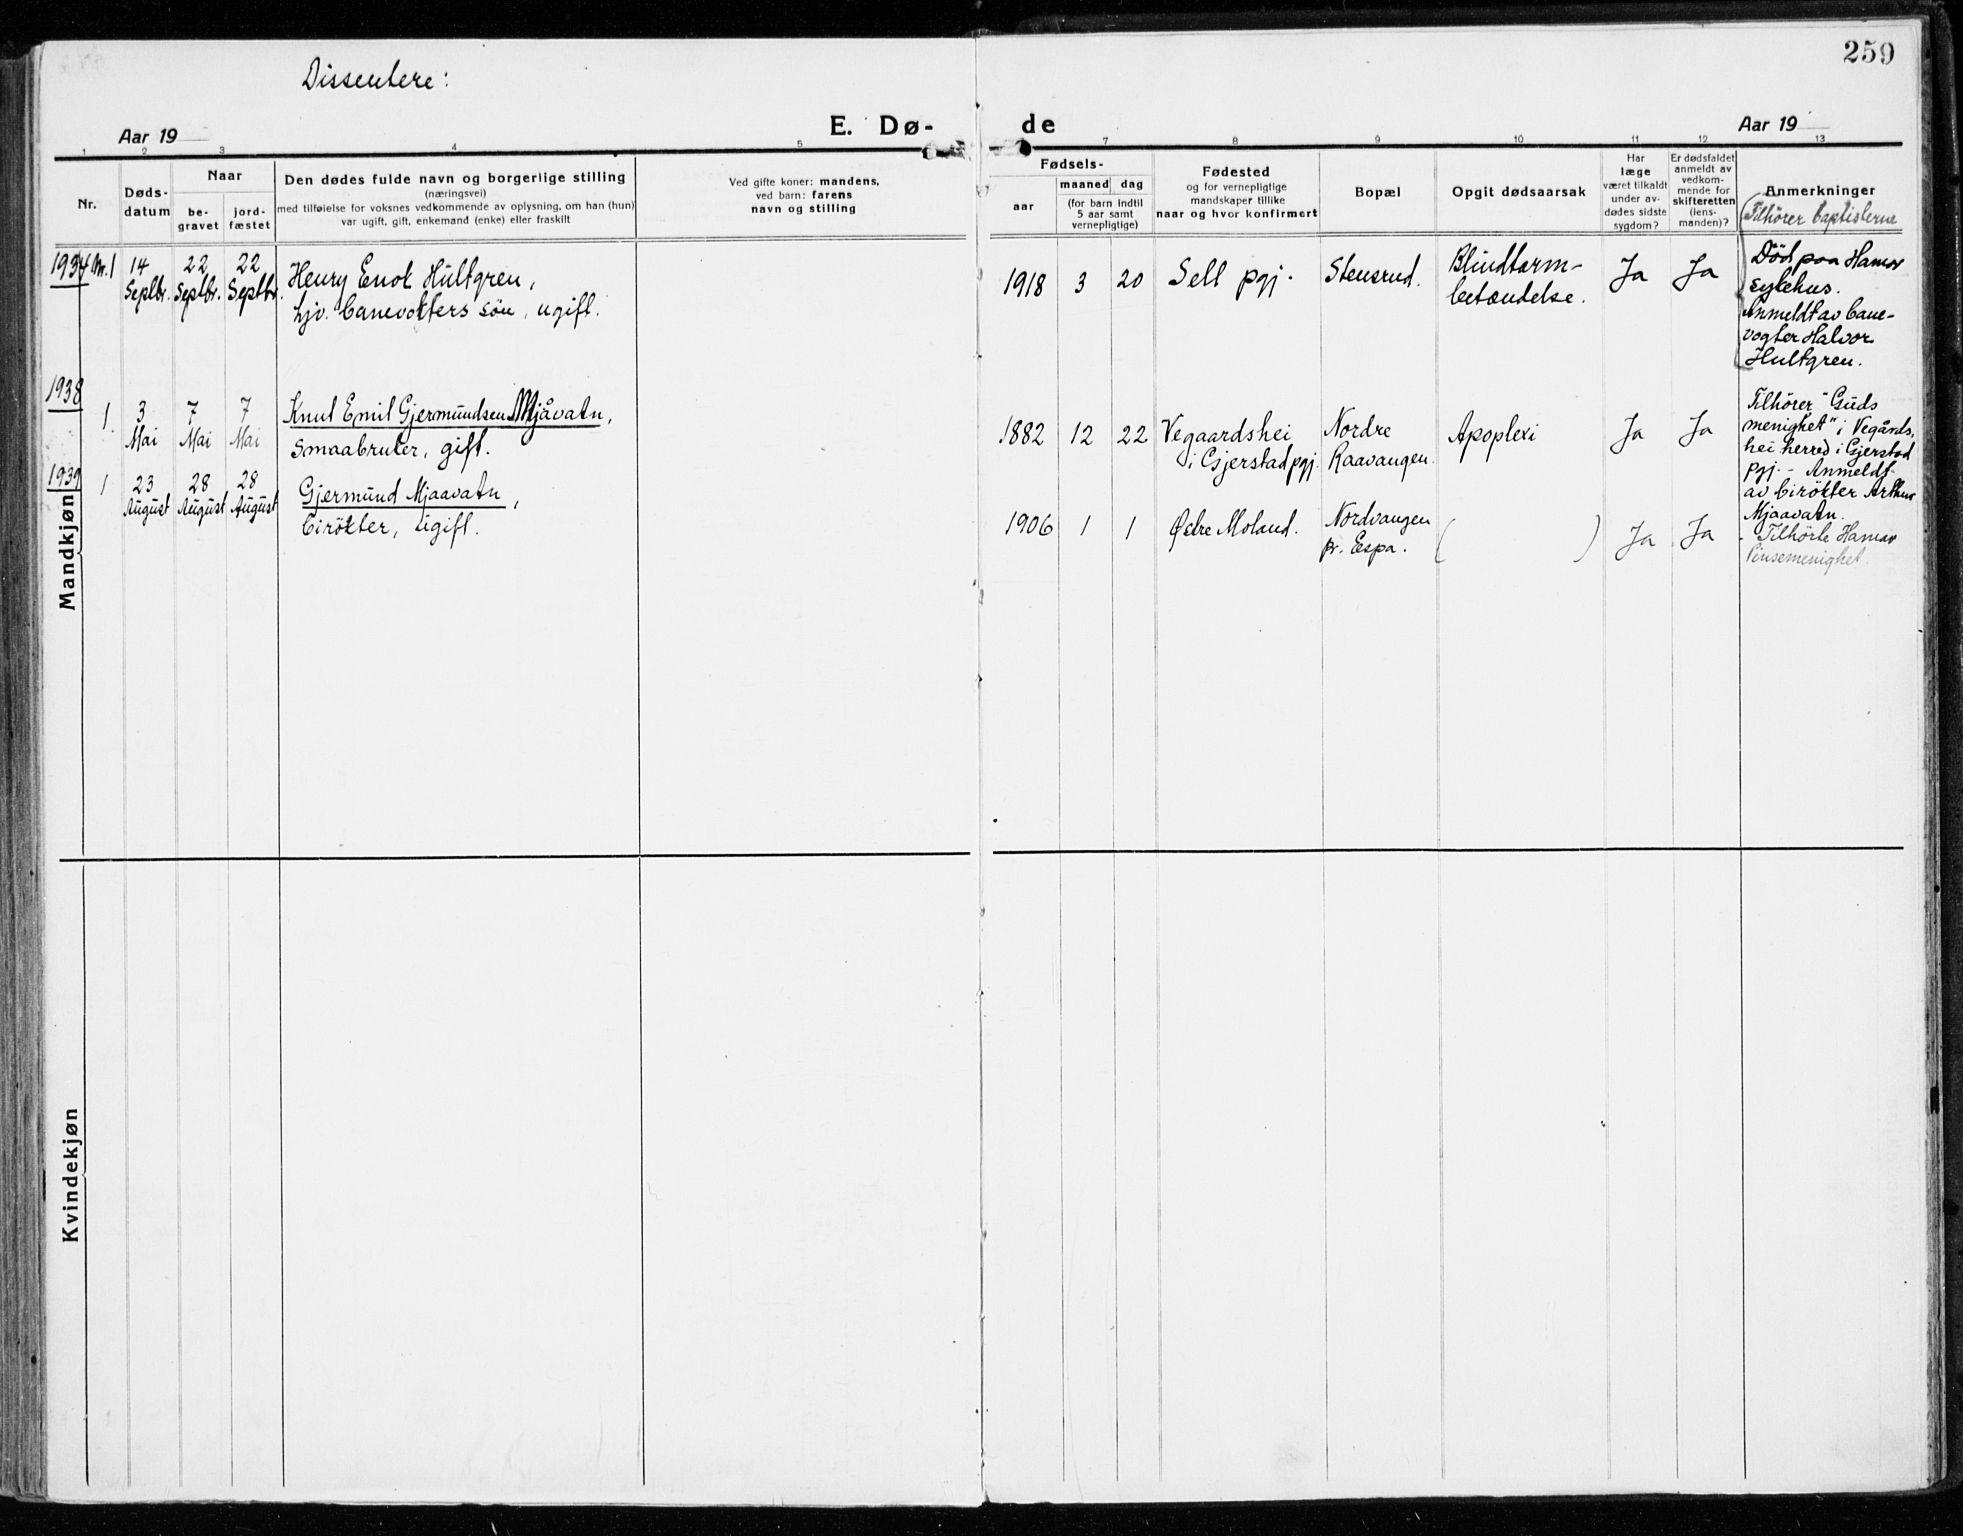 SAH, Stange prestekontor, K/L0025: Ministerialbok nr. 25, 1921-1945, s. 259